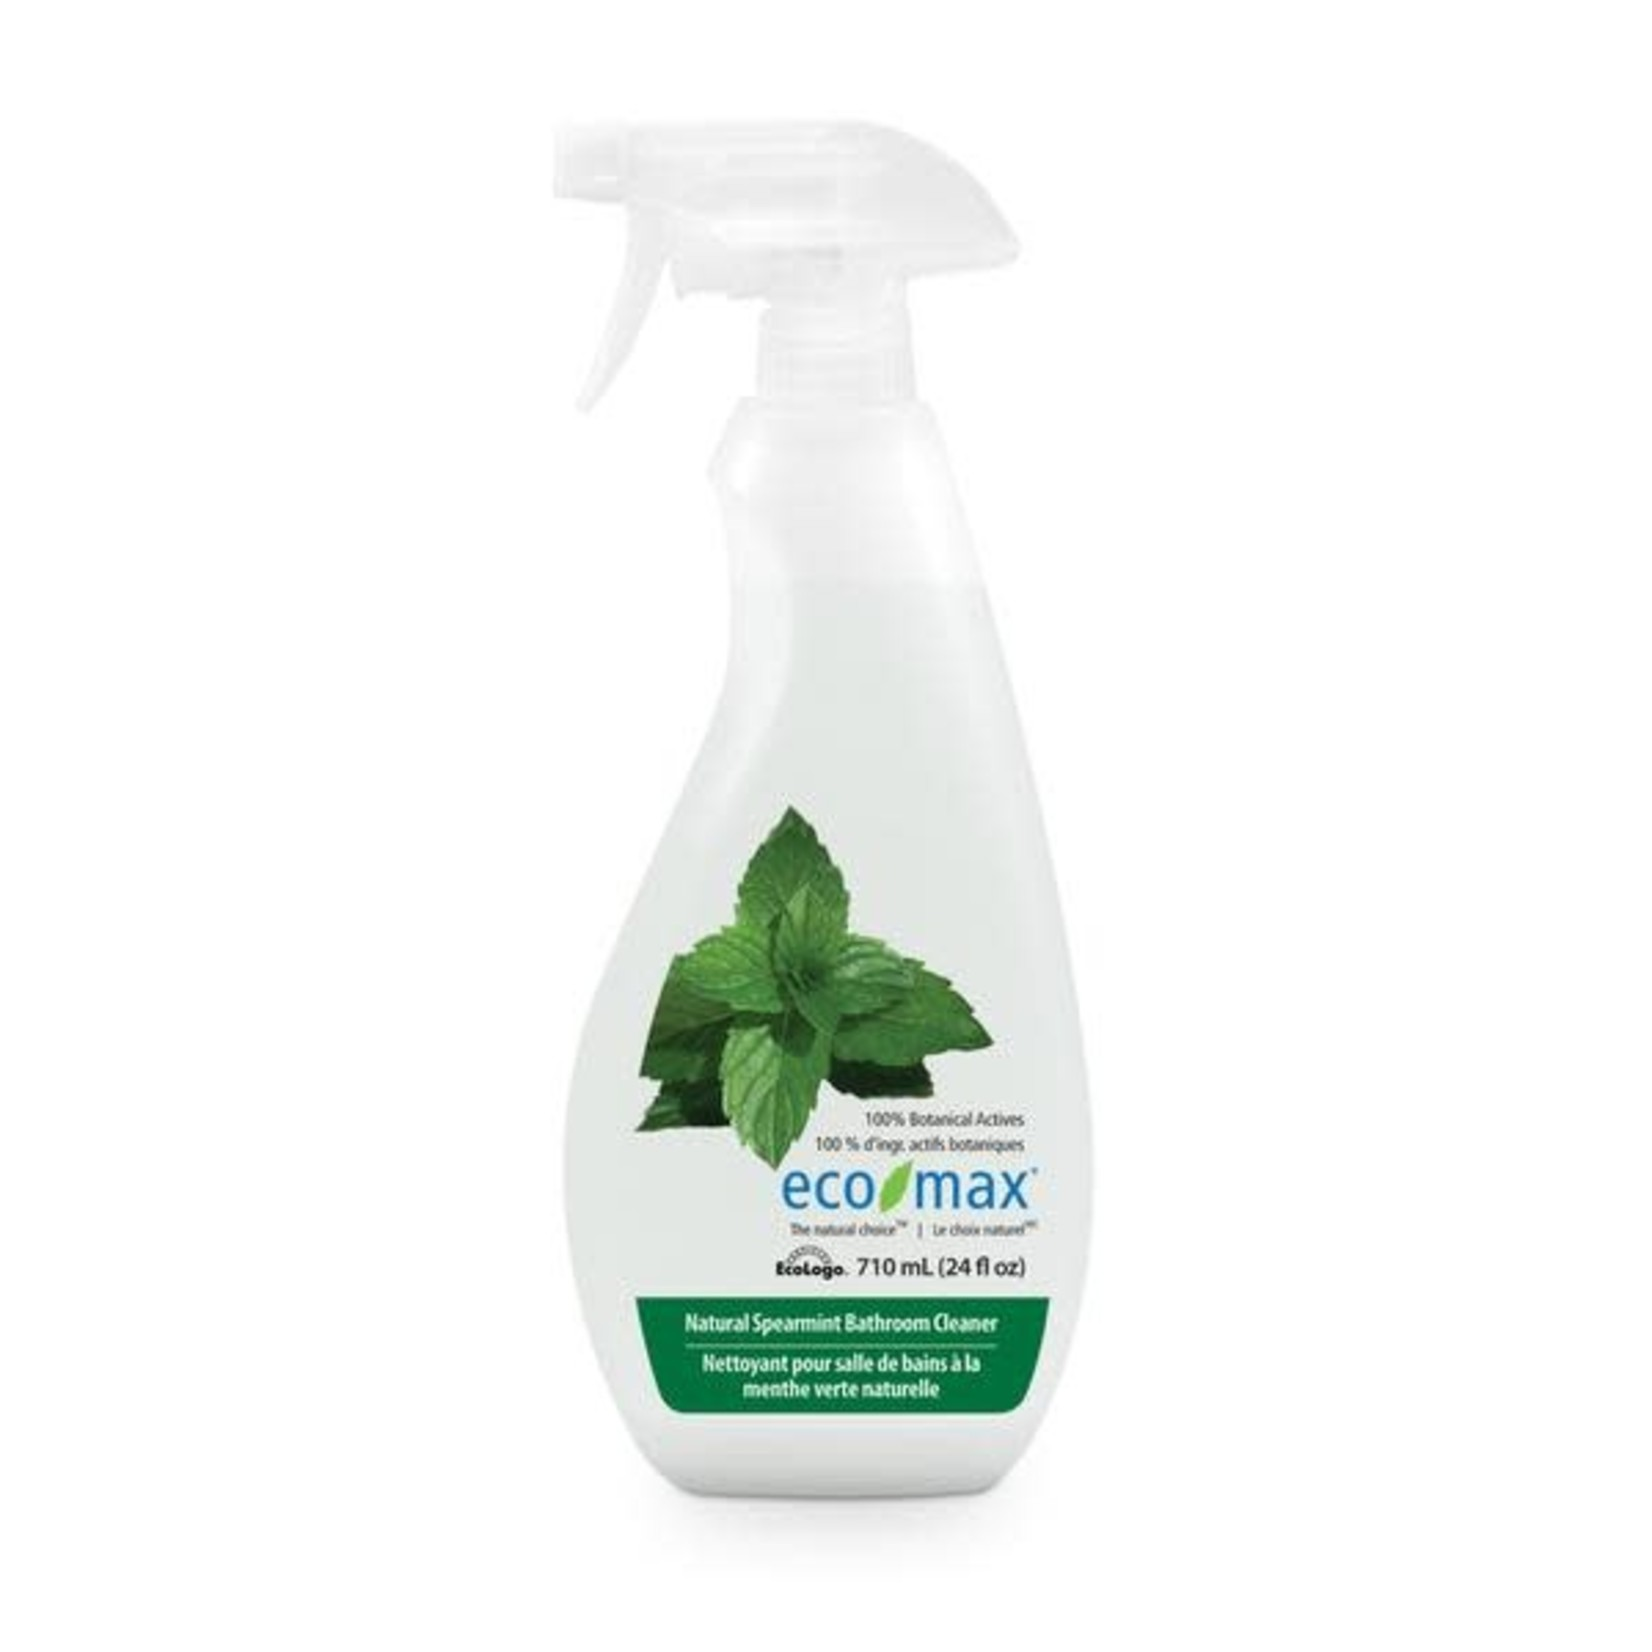 Eco-Max Eco-Max Spearmint Bathroom Cleaner 710ml